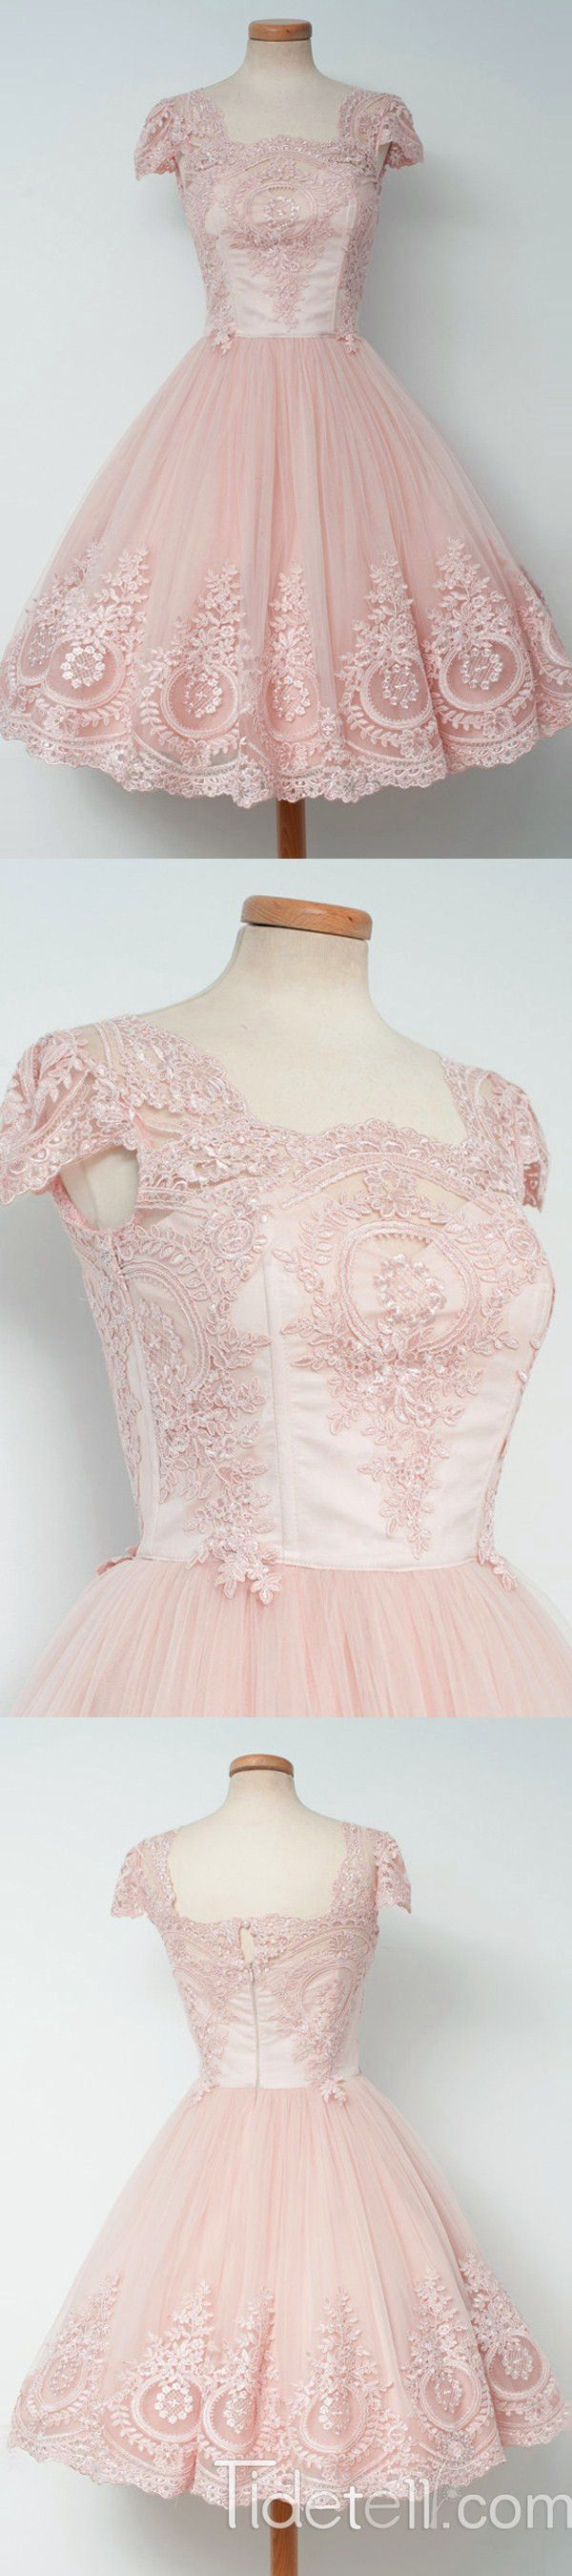 The perfect dress u pinteresu